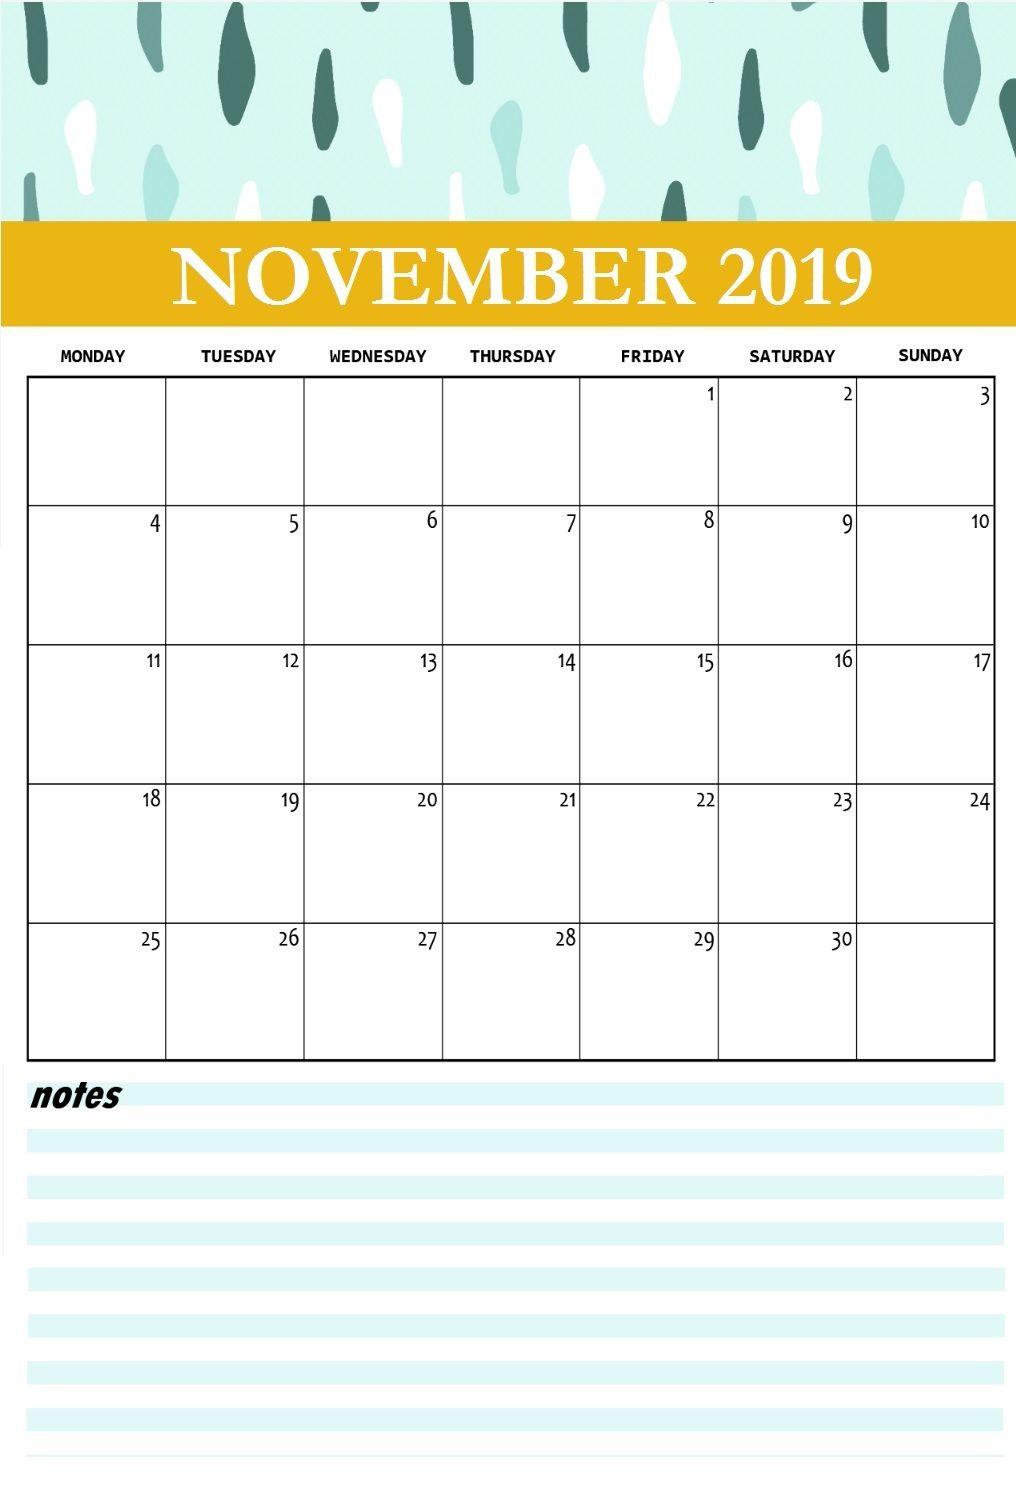 November 2019 Calendar Cute